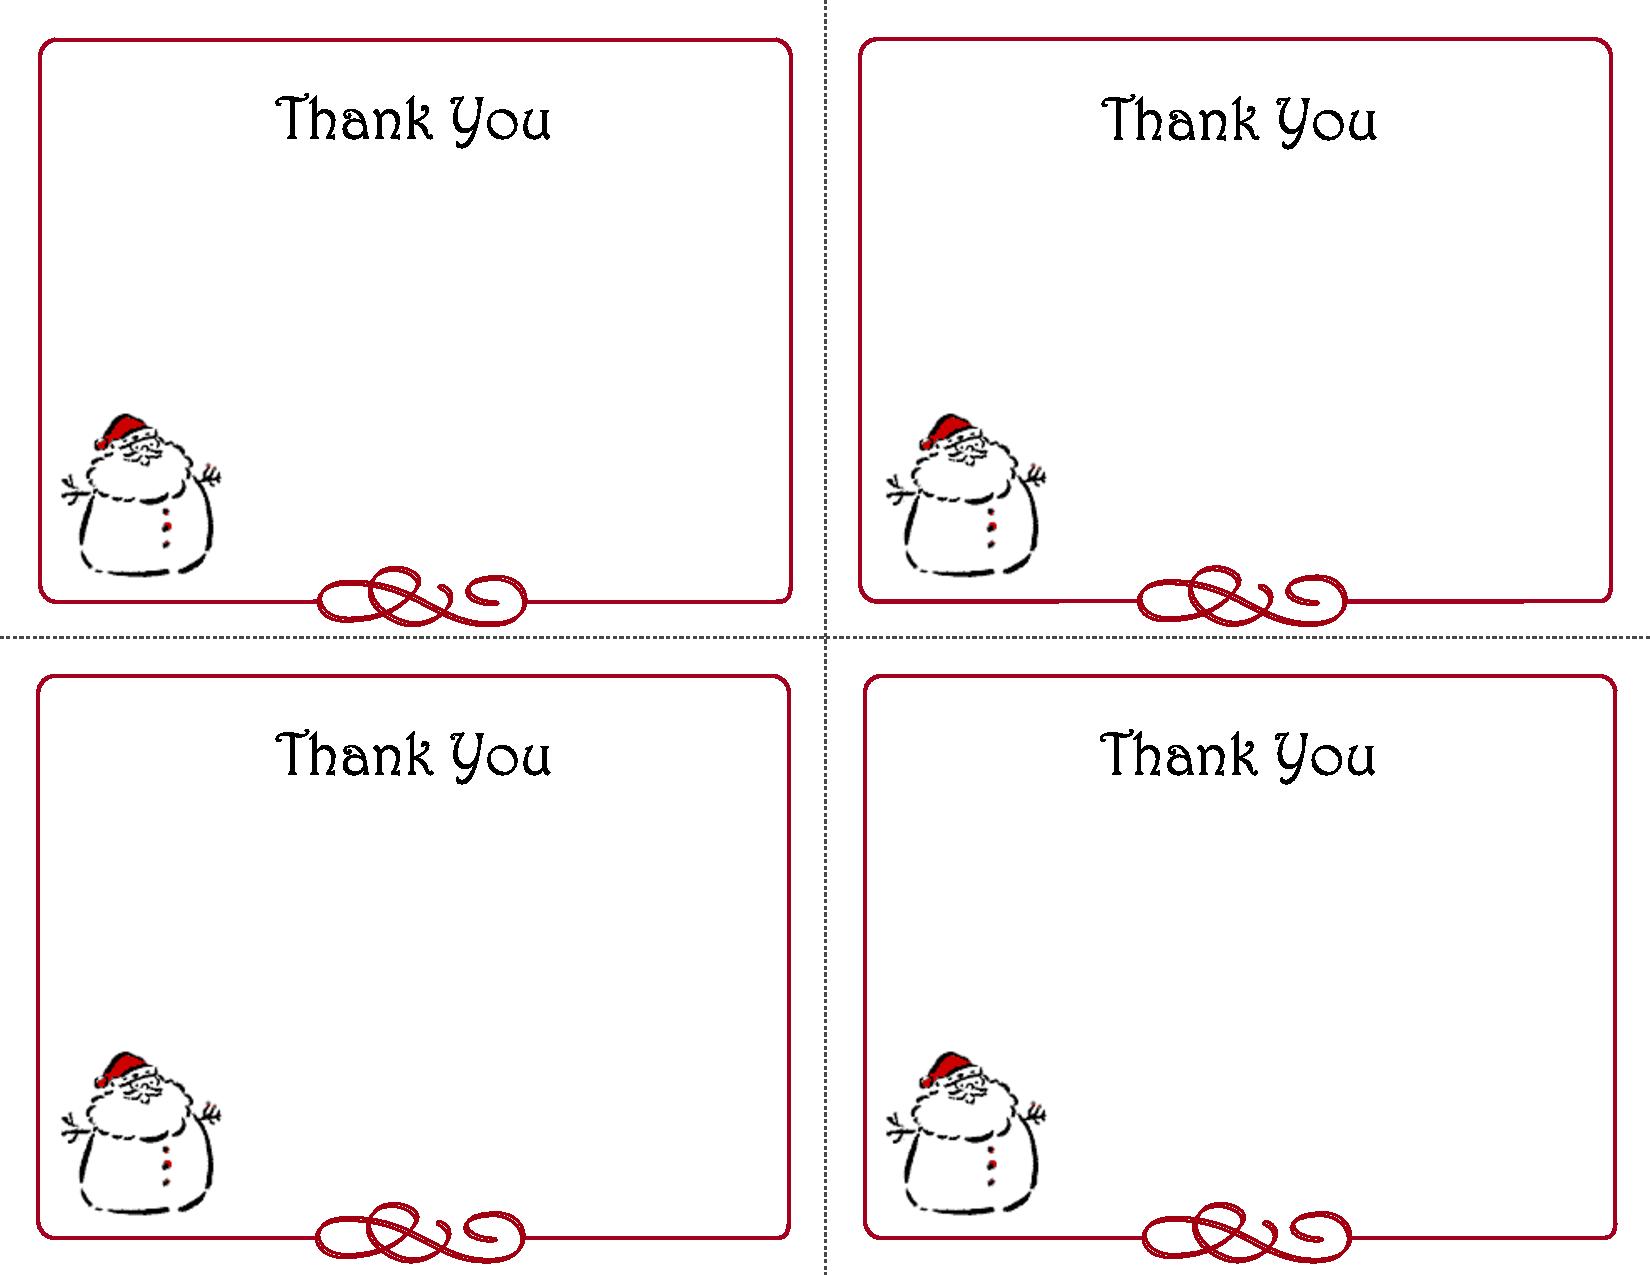 Free Thank You Cards Printable | Free Printable Holiday Gift Tags - Free Printable Thank You Notes